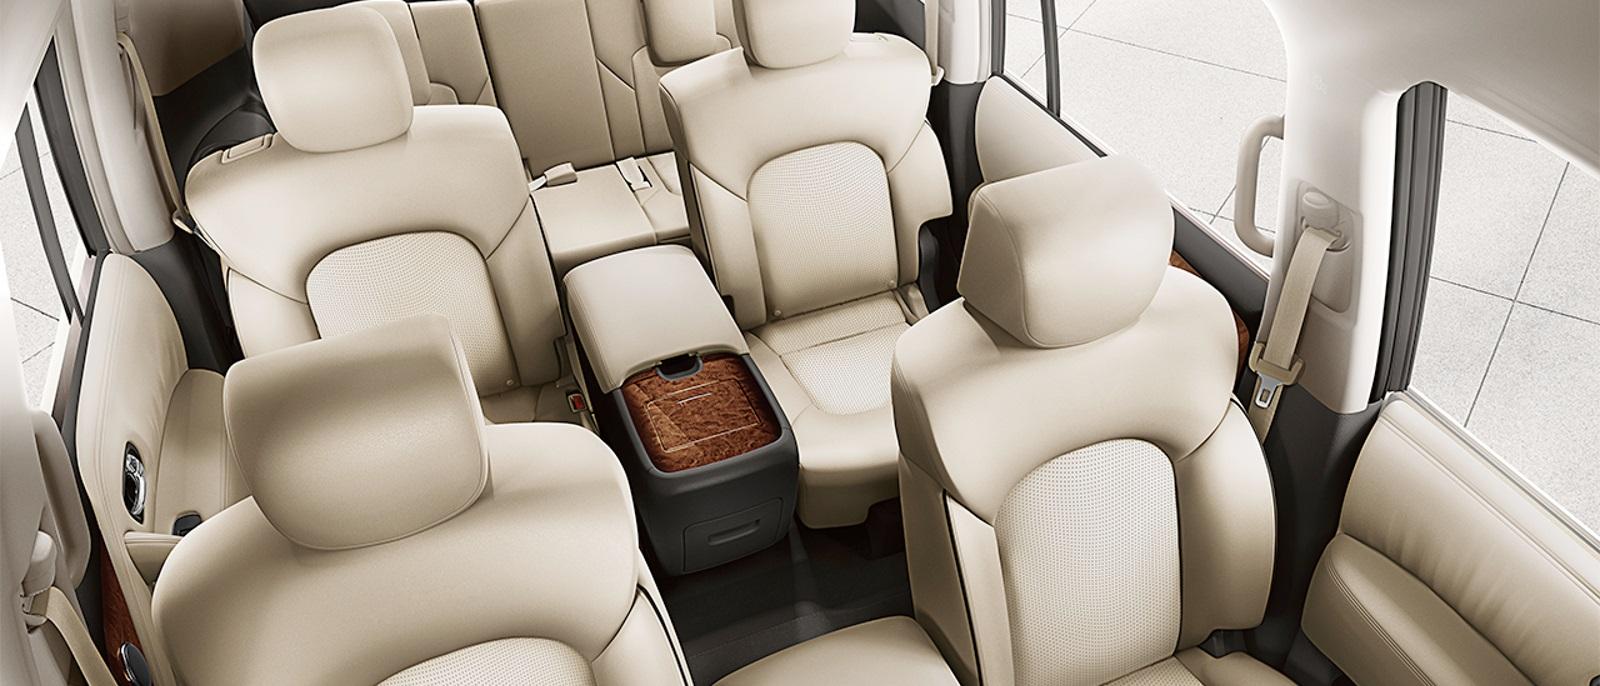 2017-nissan-armada-interior-almond-leather-original1